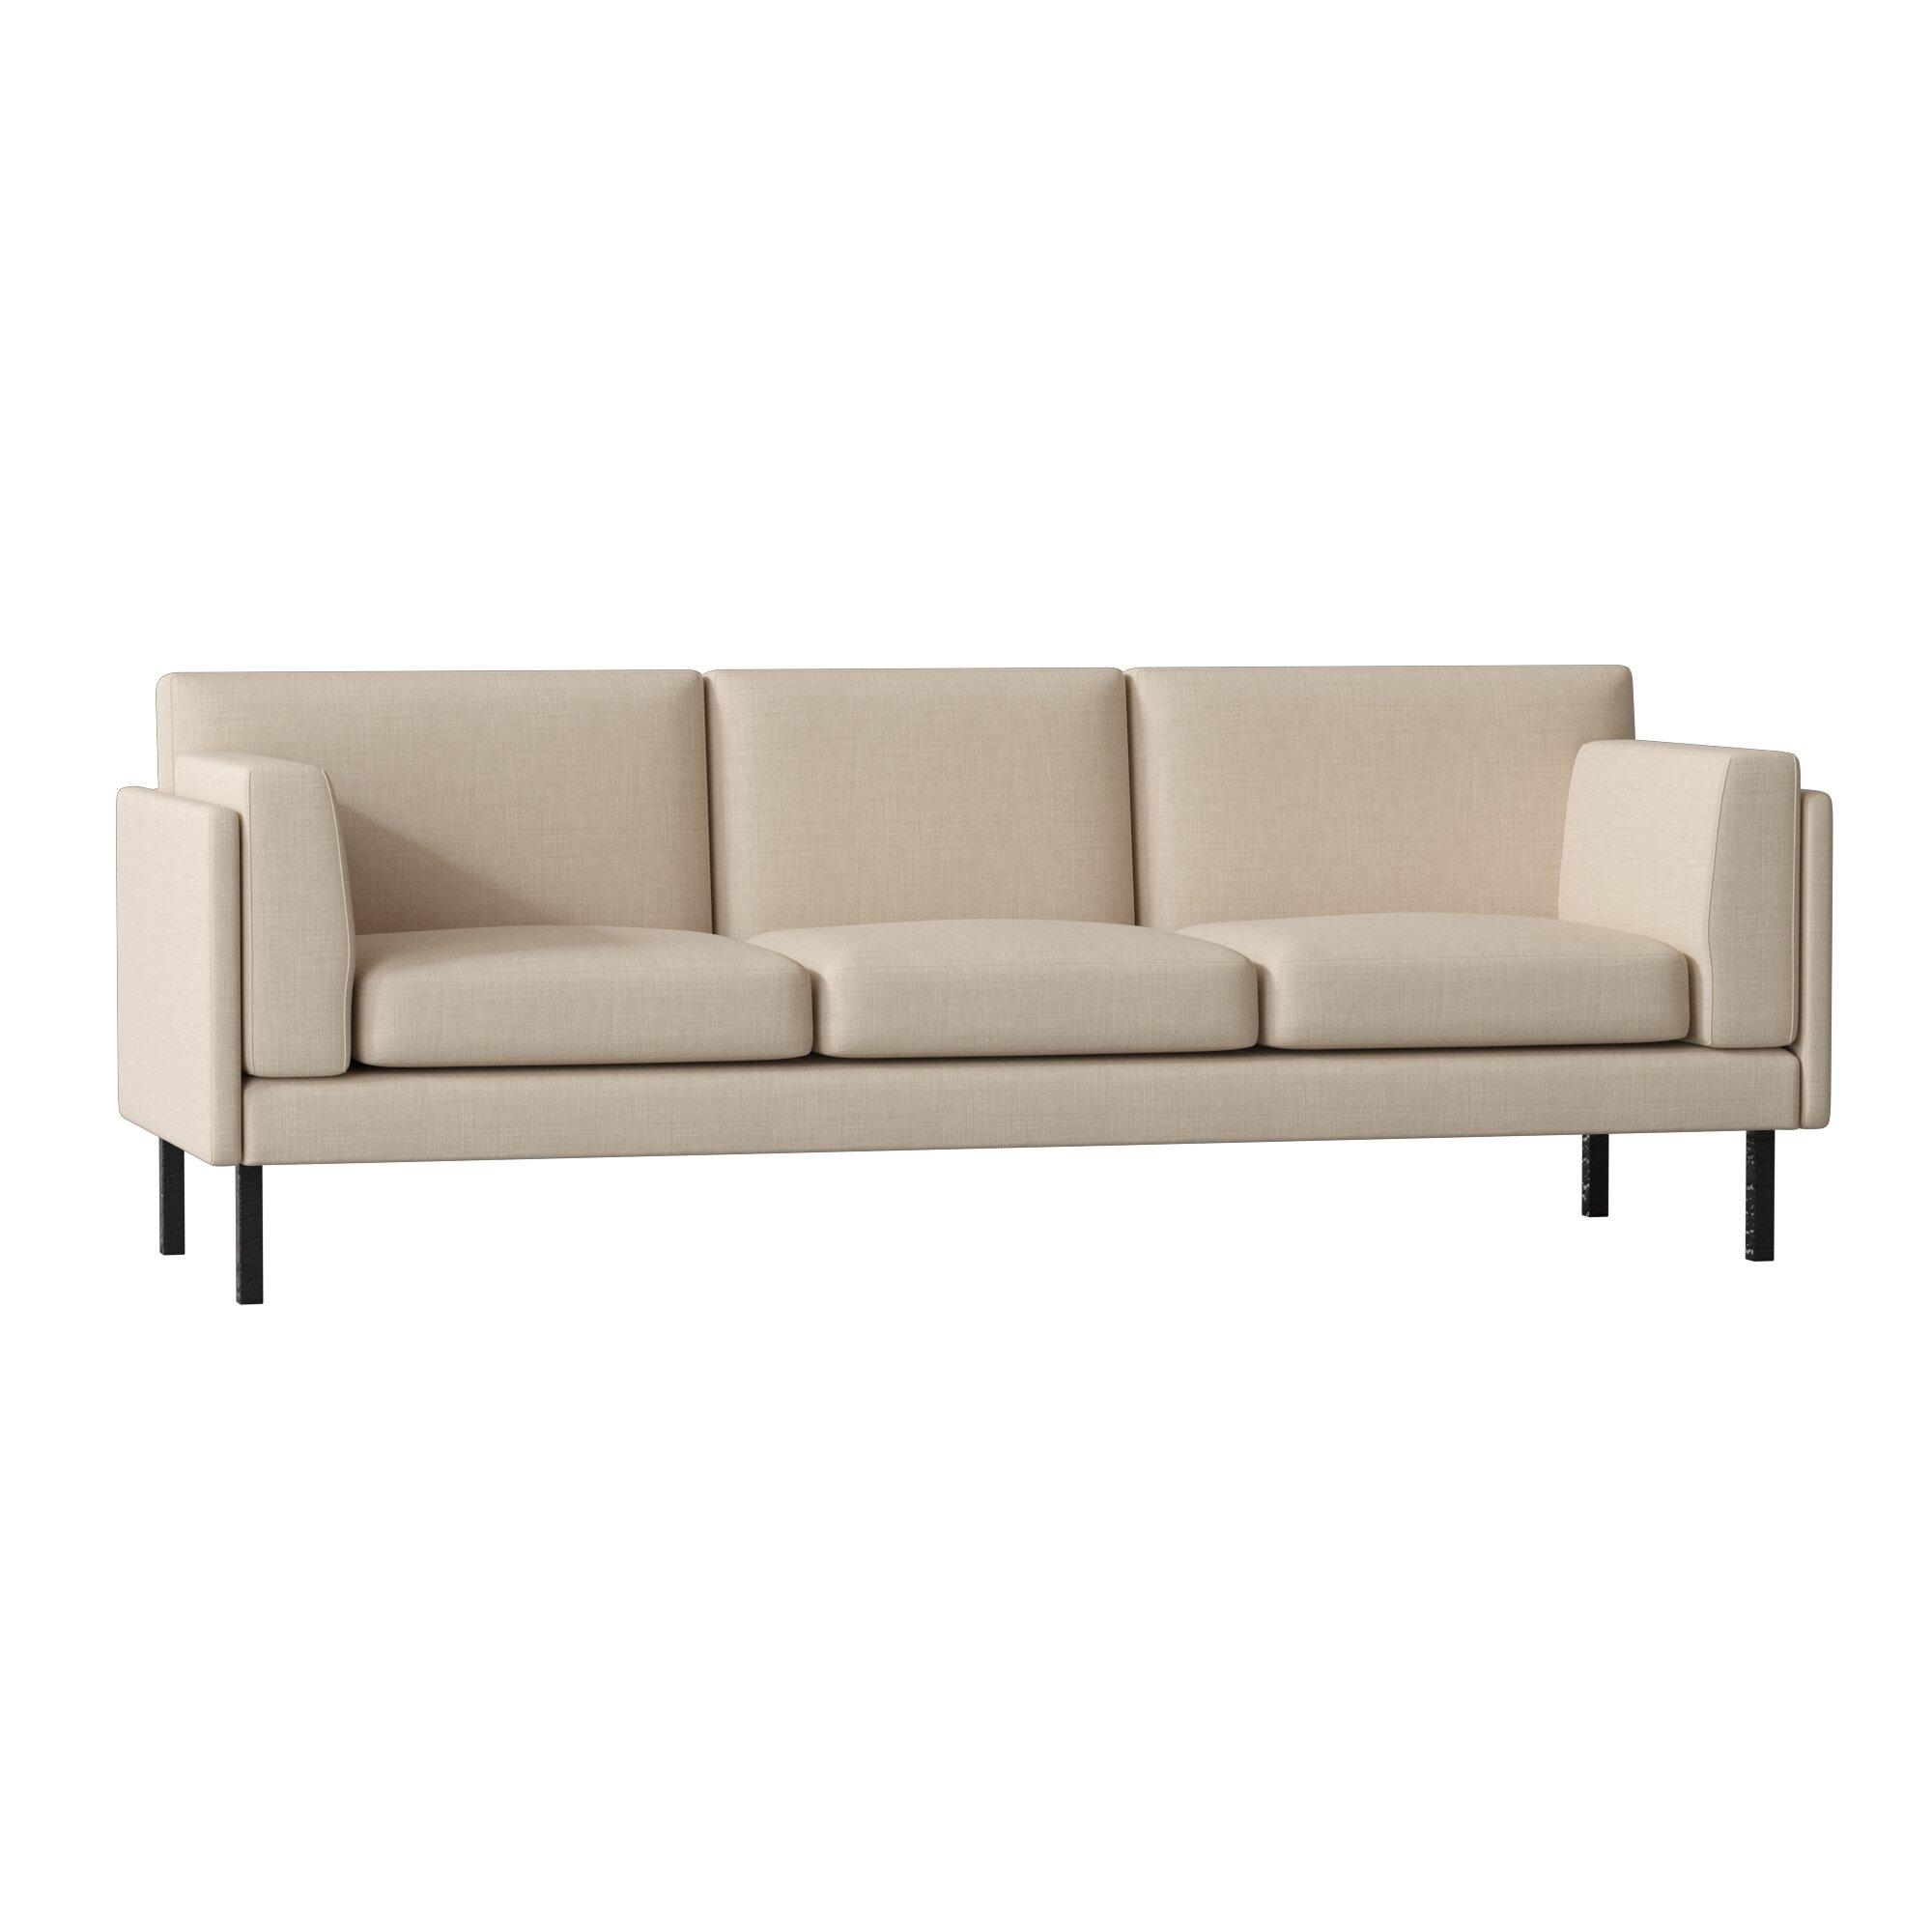 Brilliant Skinny Fat Sofa Spiritservingveterans Wood Chair Design Ideas Spiritservingveteransorg